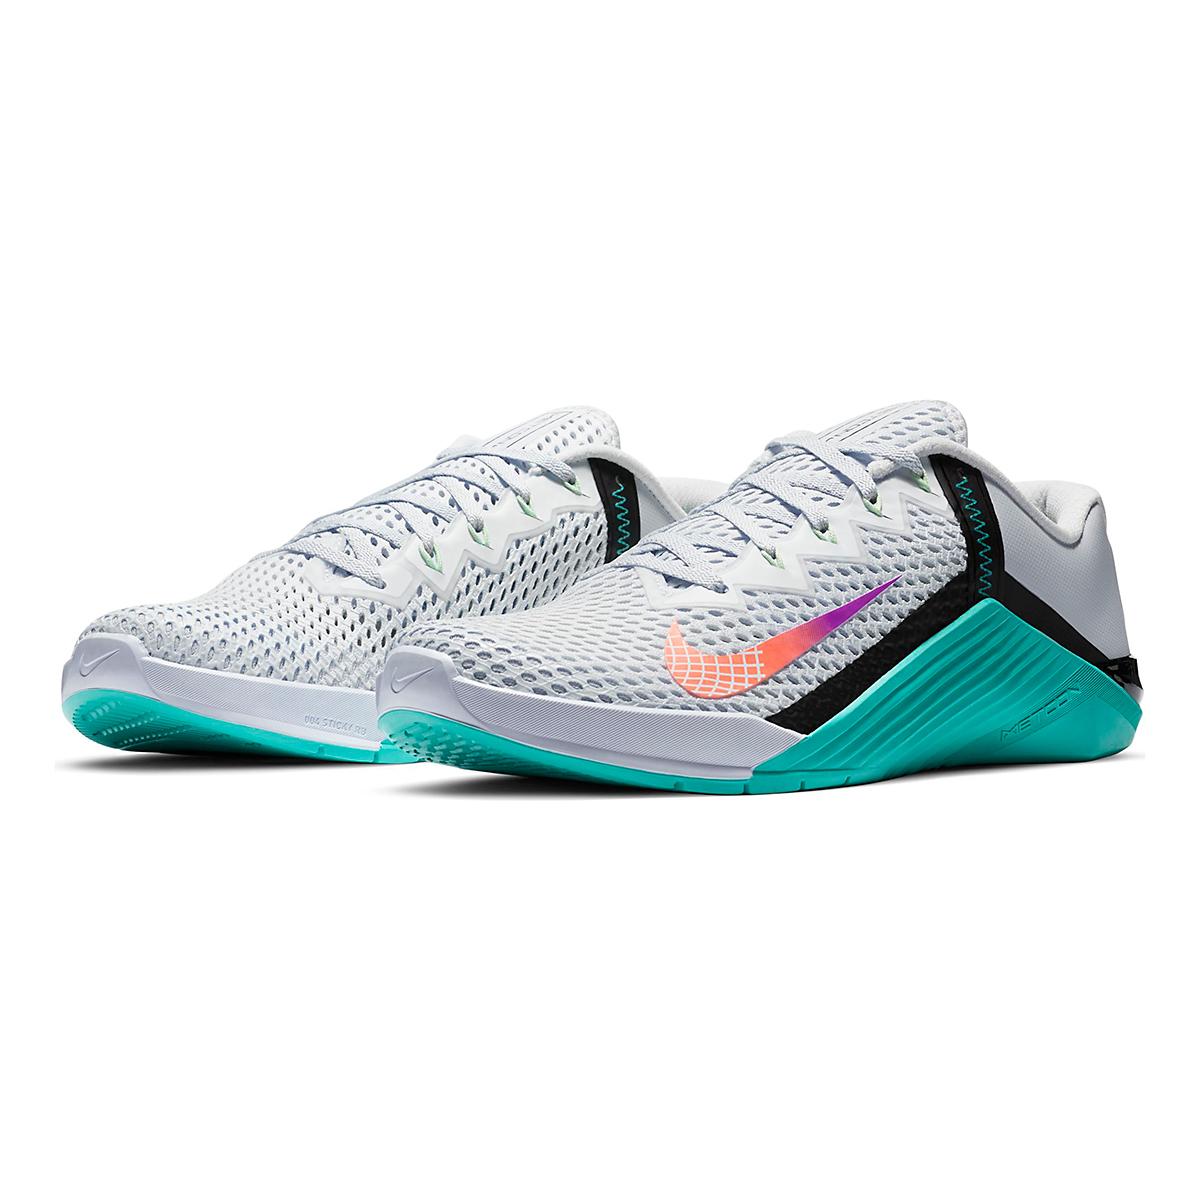 Men's Nike Nike Metcon 6 Training Shoes - Color: Football Grey/Hyper Jade/Black/Flash Crimson - Size: 3.5 - Width: Regular, Football Grey/Hyper Jade/Black/Flash Crimson, large, image 3